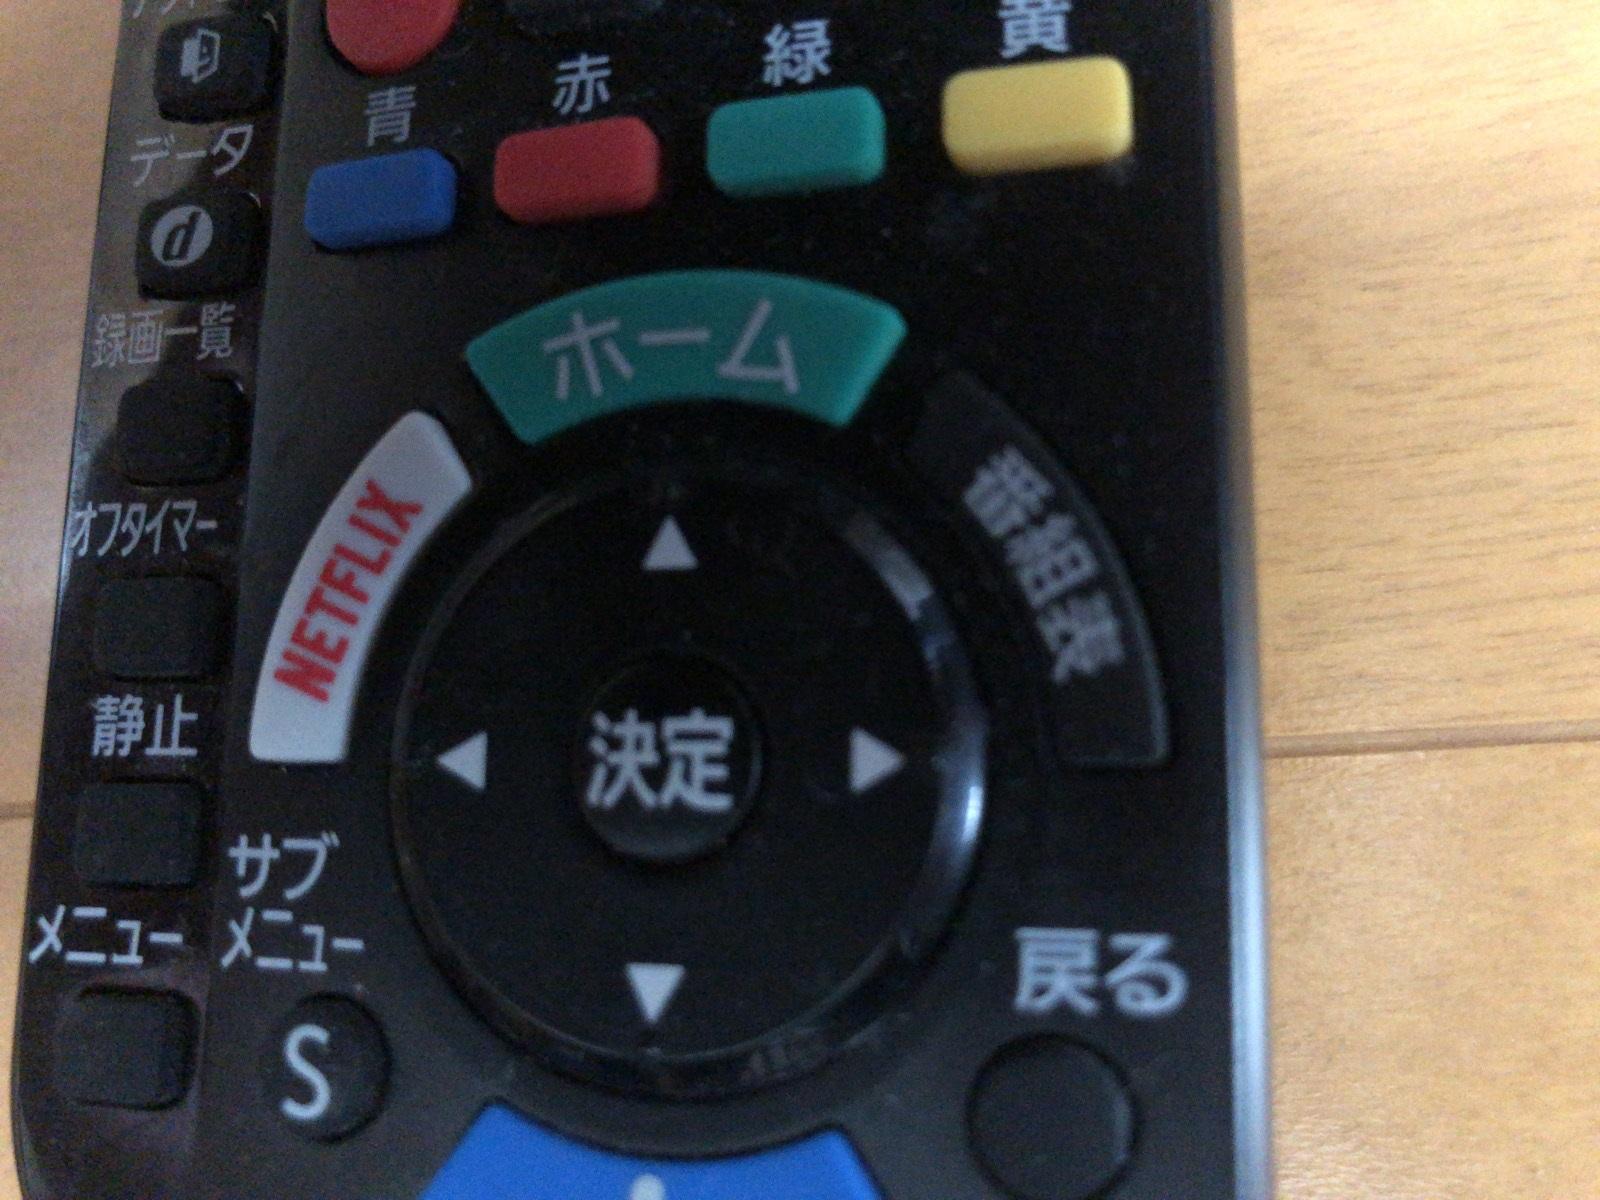 Netflixがテレビで繋がらない! - リモコンのNETFLIXボタン